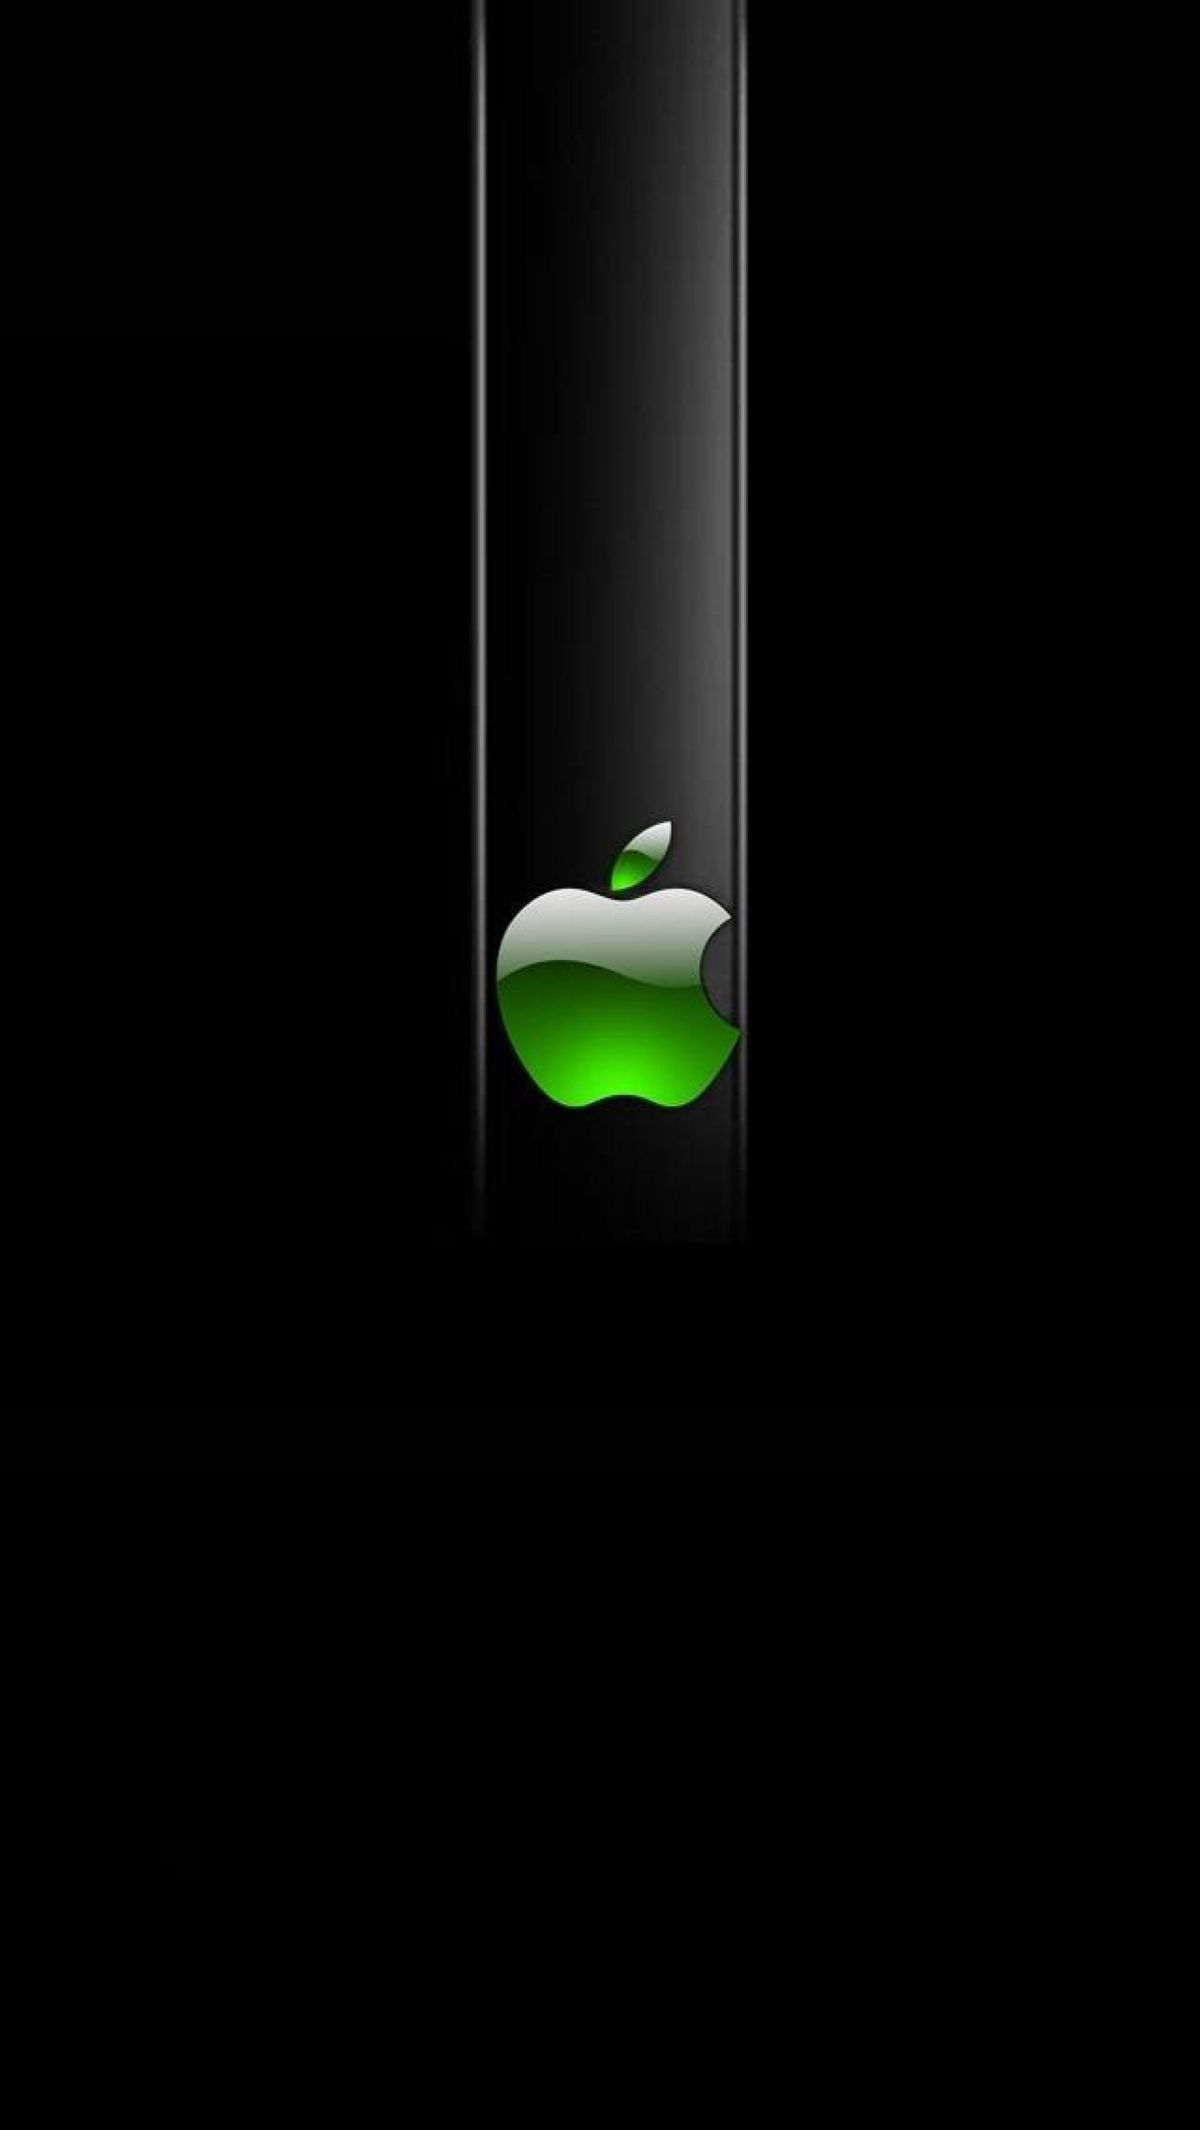 Pin By Sacko On Apple Apple Wallpaper Apple Iphone Wallpaper Hd Apple Wallpaper Iphone